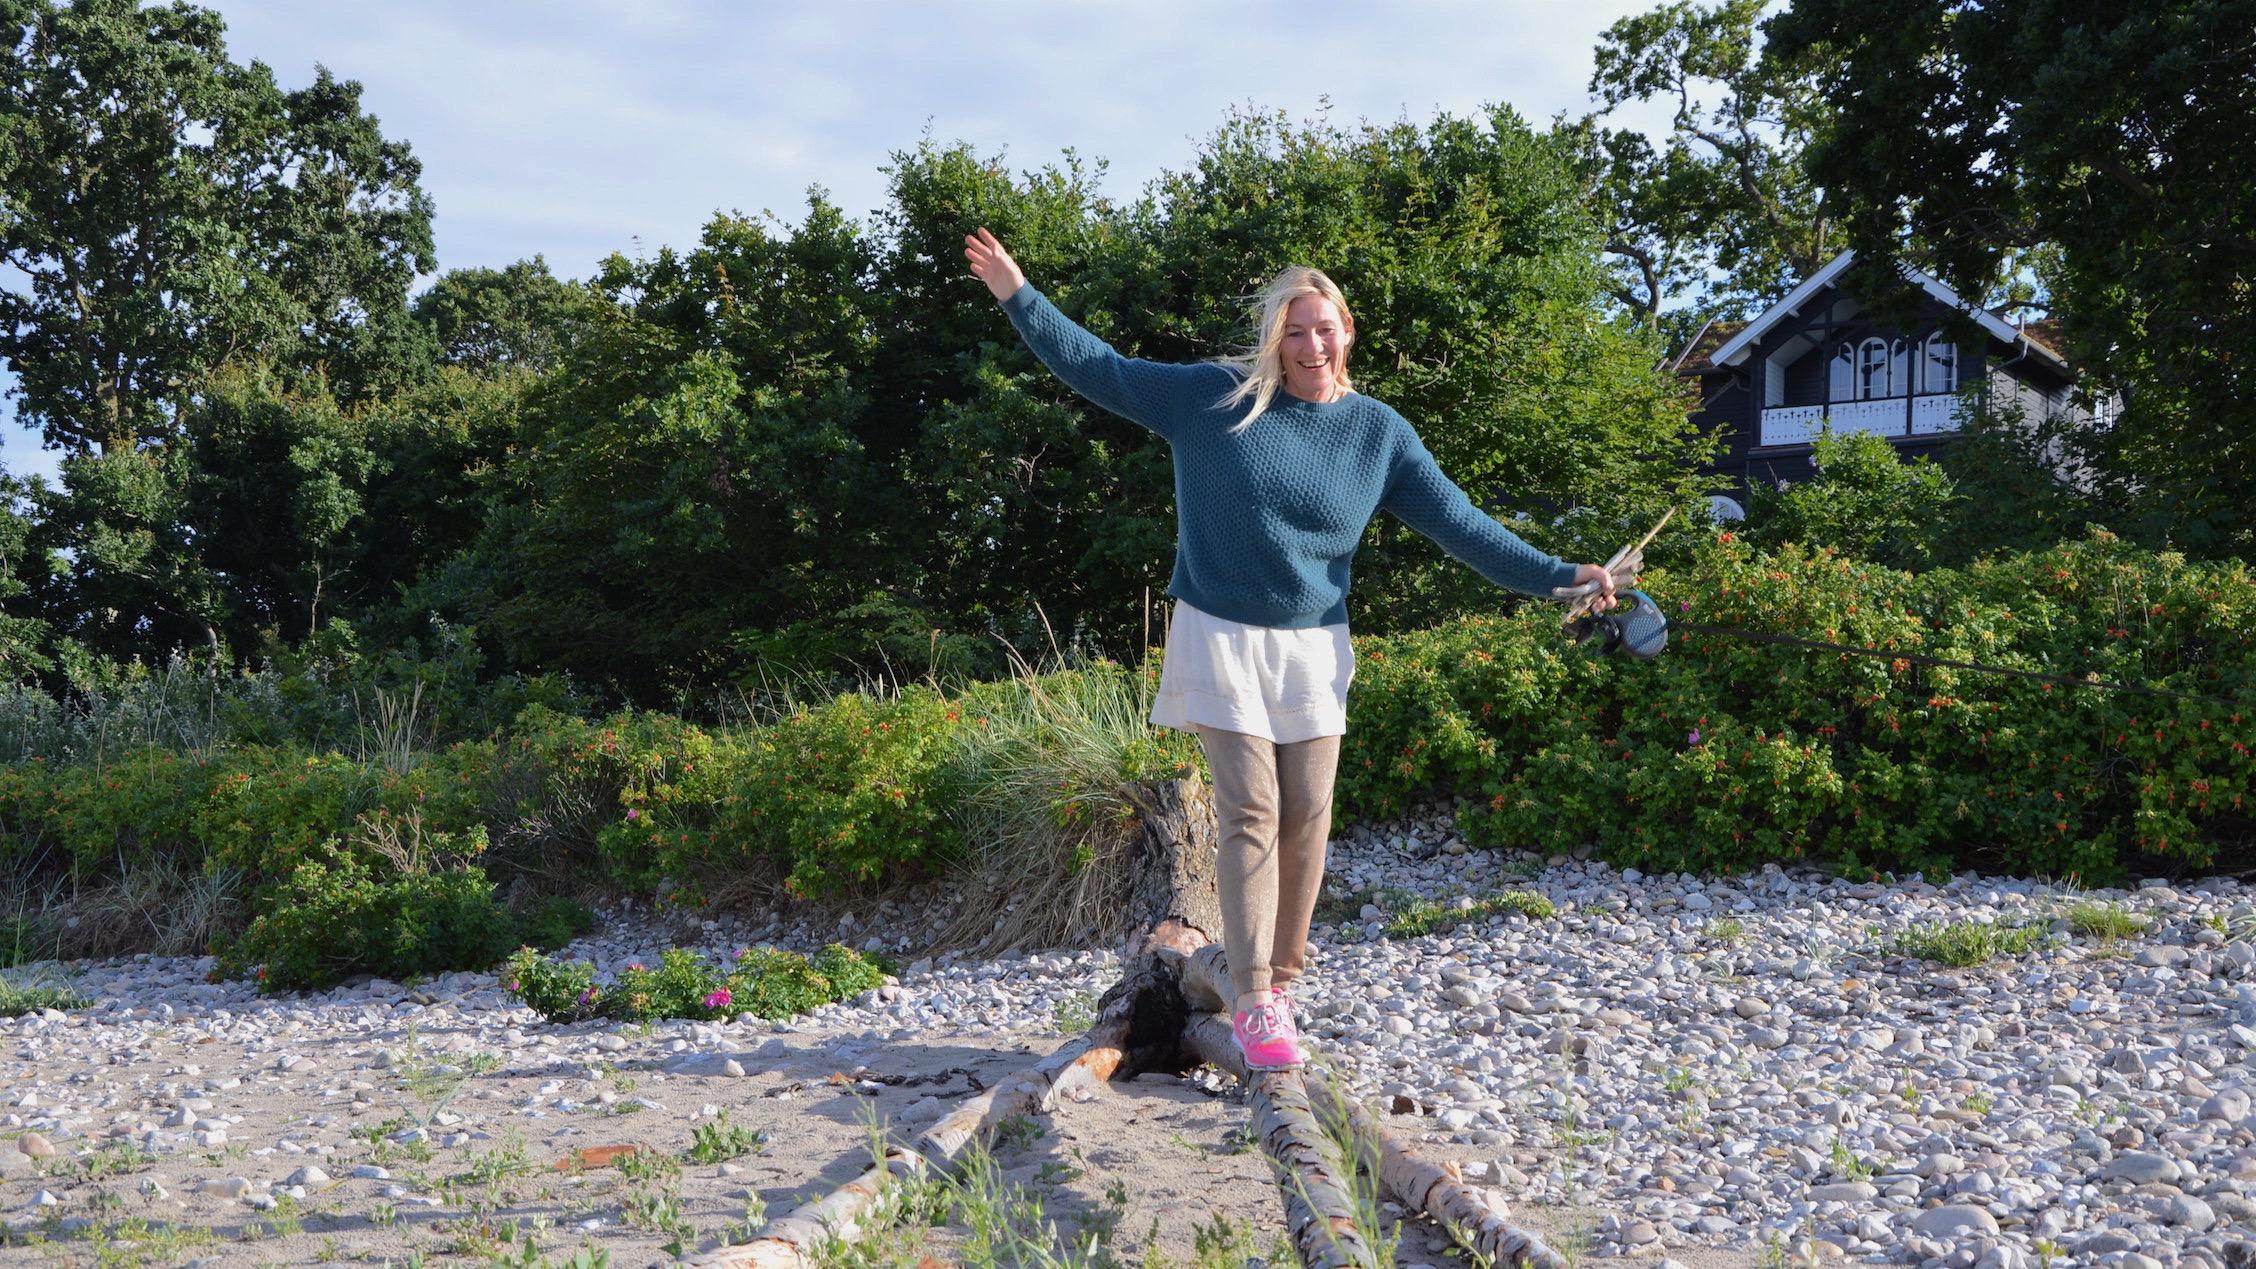 Anne Kamille Ahlefeldt. Balance. Free Spirit.